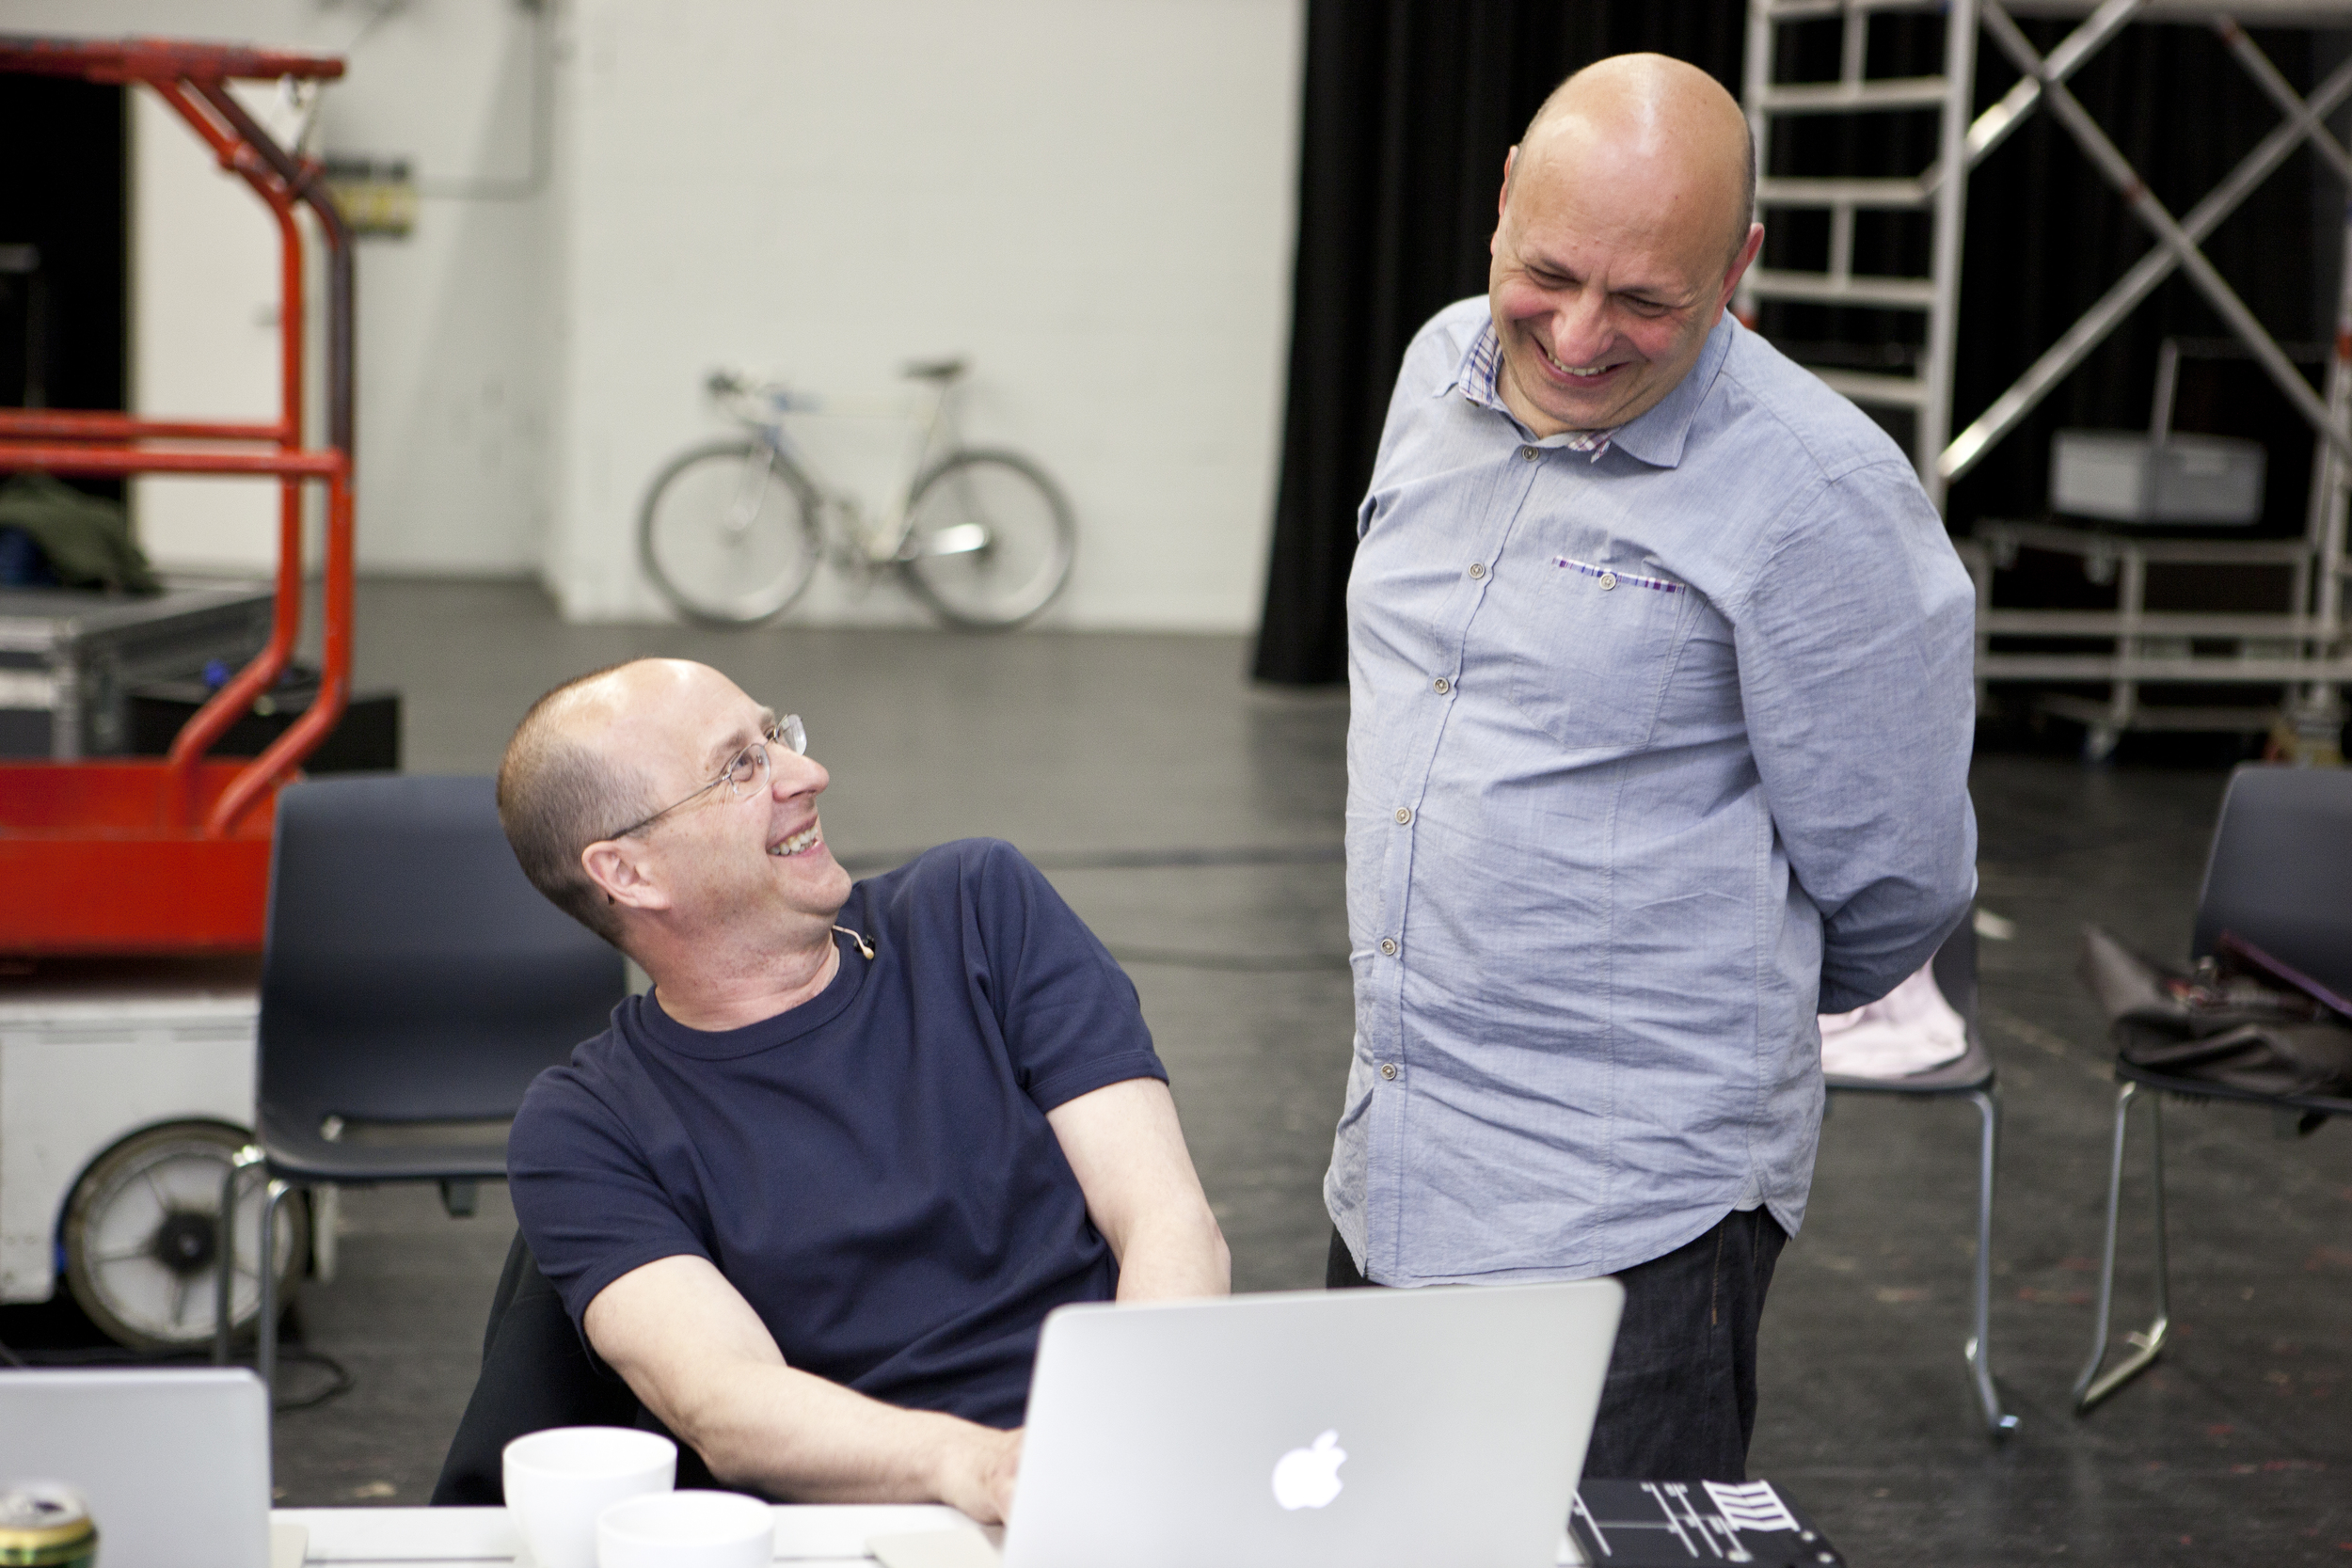 Jonathan Burrows (left) and Matteo Fargion (right). Photo courtesy Motion Bank